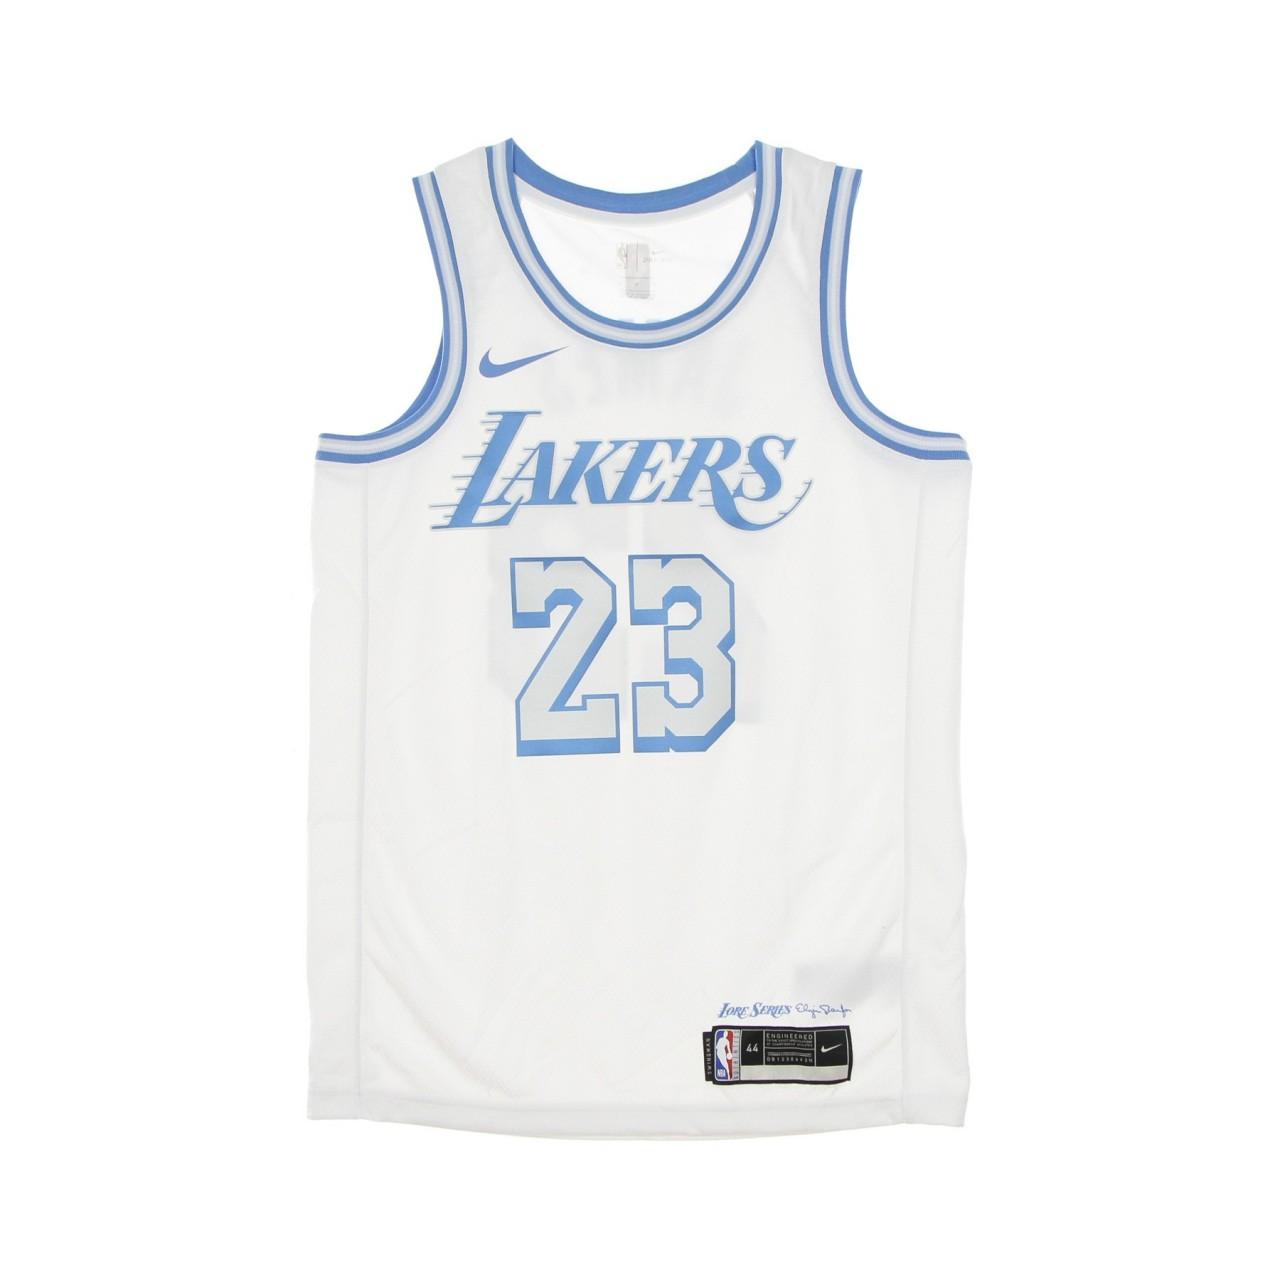 NIKE NBA NBA SWINGMAN JERSEY CITY EDITION 2020 N.23 LEBRON JAMES LOSLAK CN1737-102